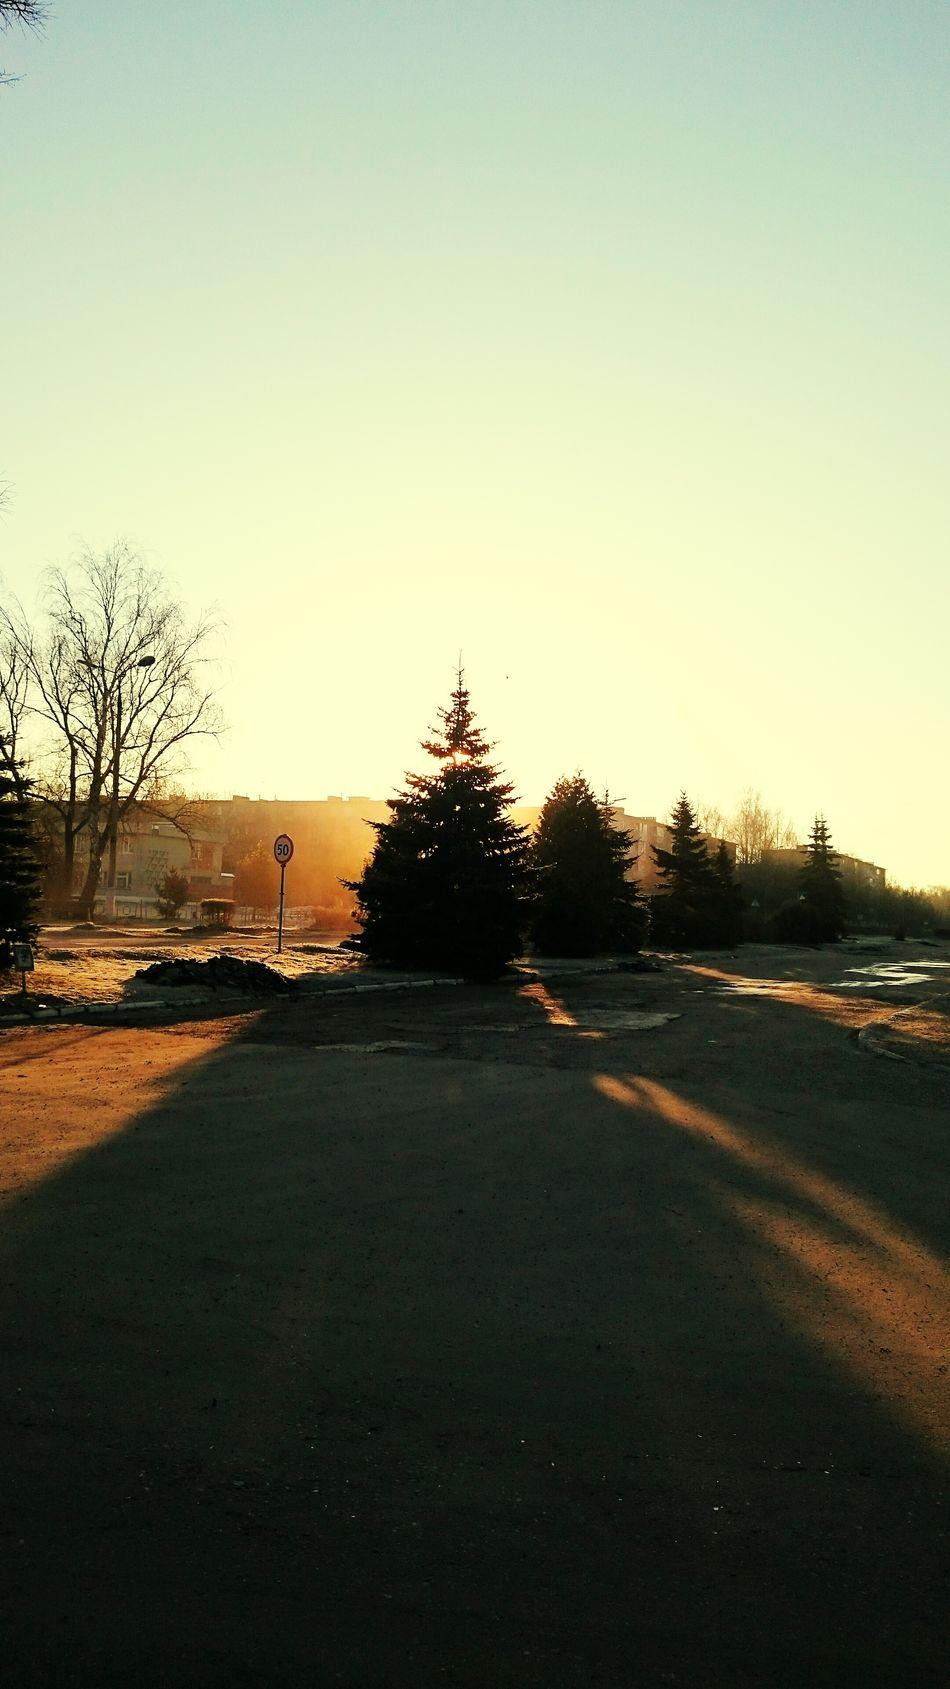 Утро!!! Солнышко за елку зацепилось:-)